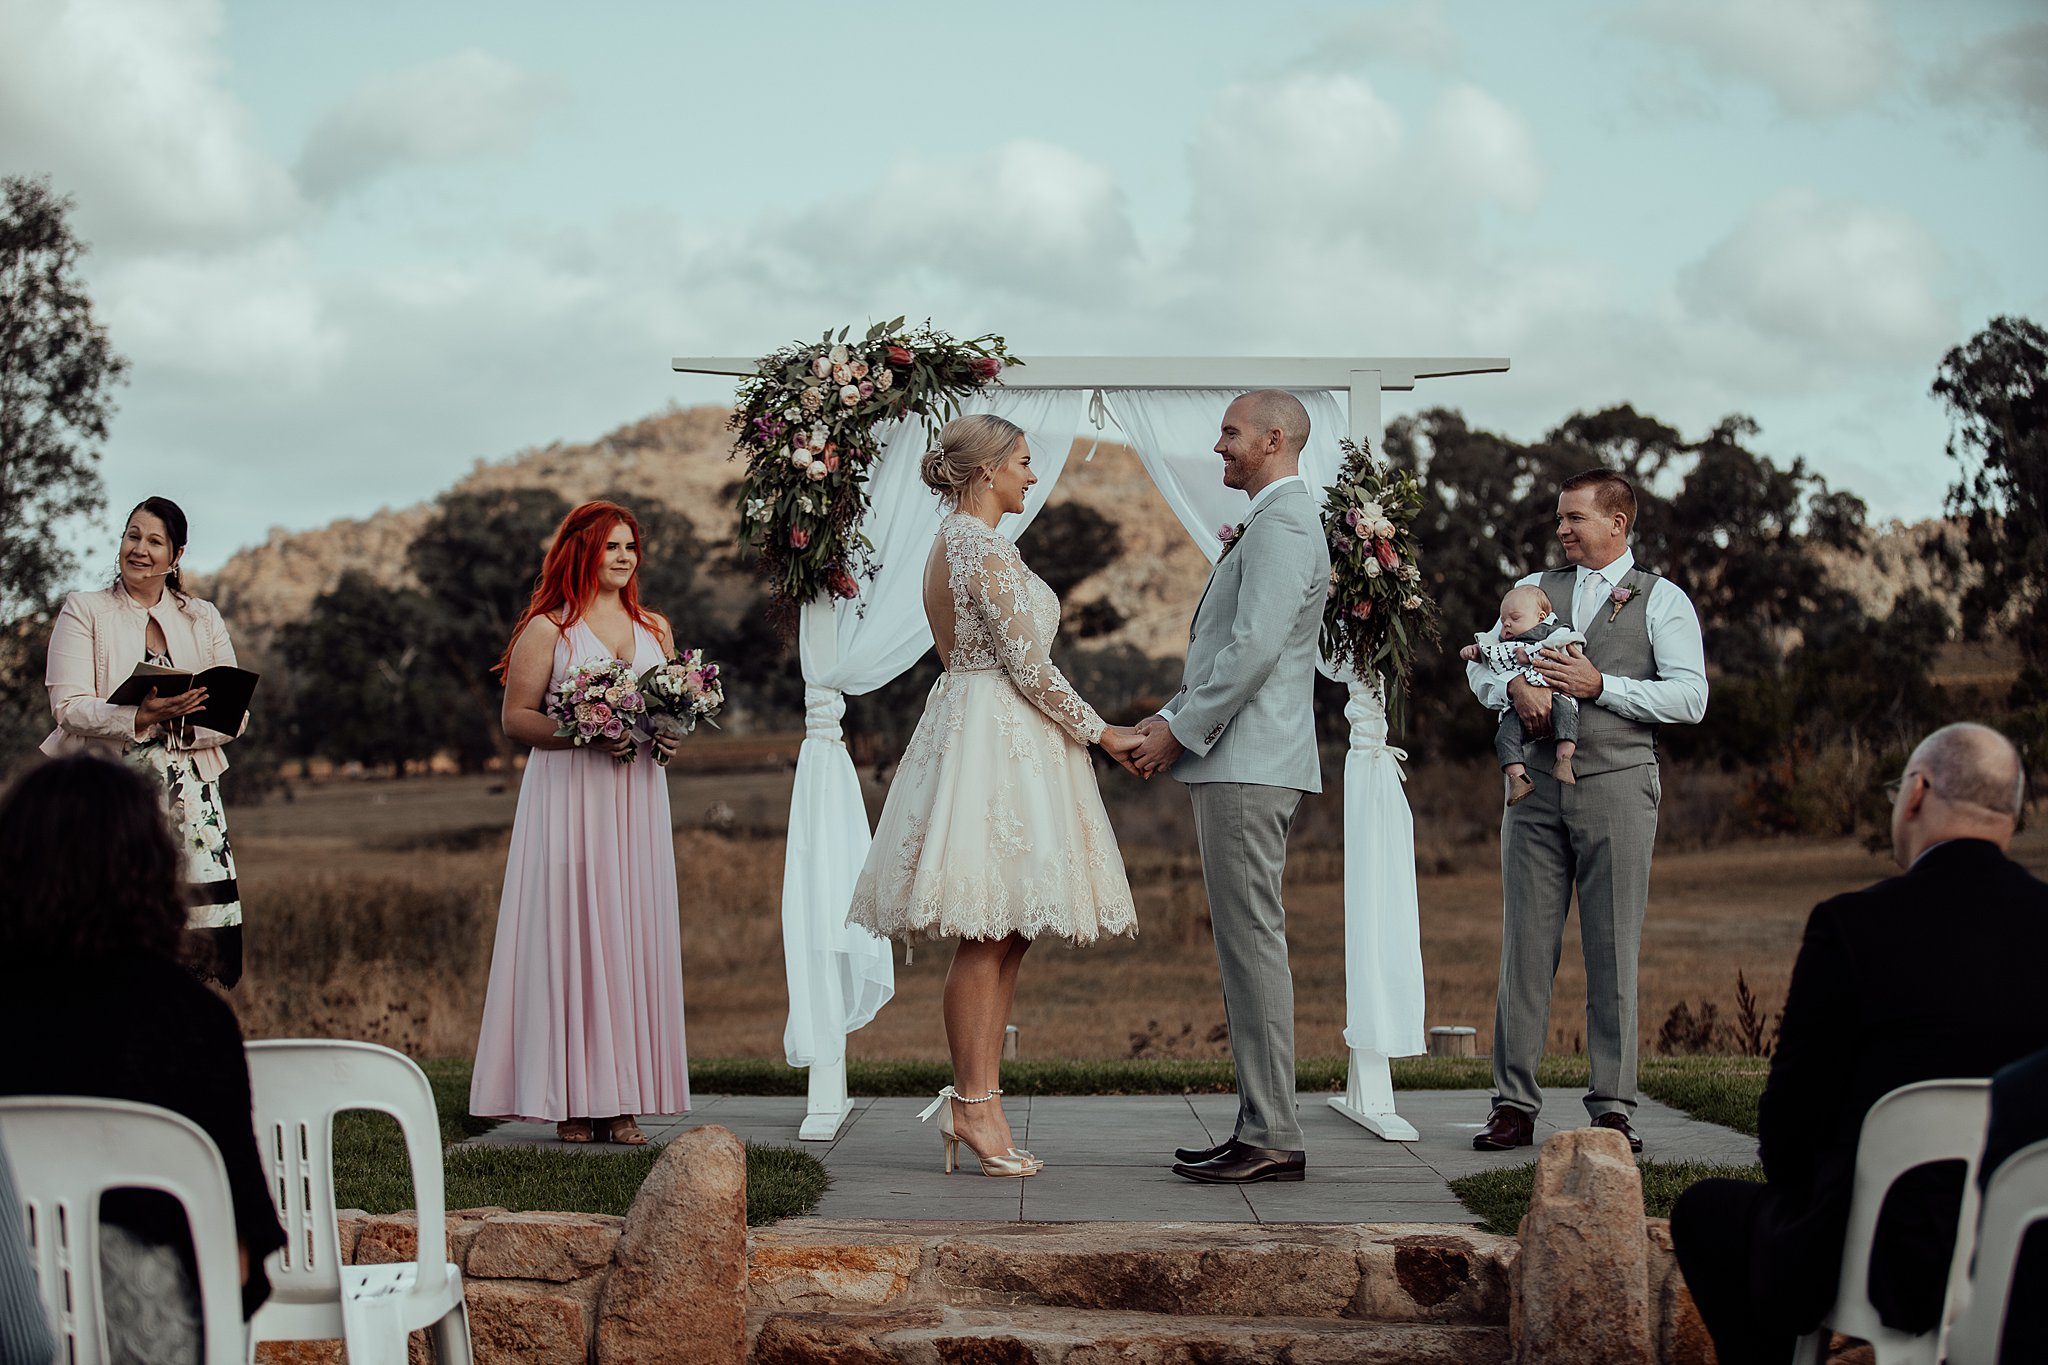 mickalathomas_puremacphotography_weddingphotographer_couplephotographer_Sheppartonphotographer_3425.jpg